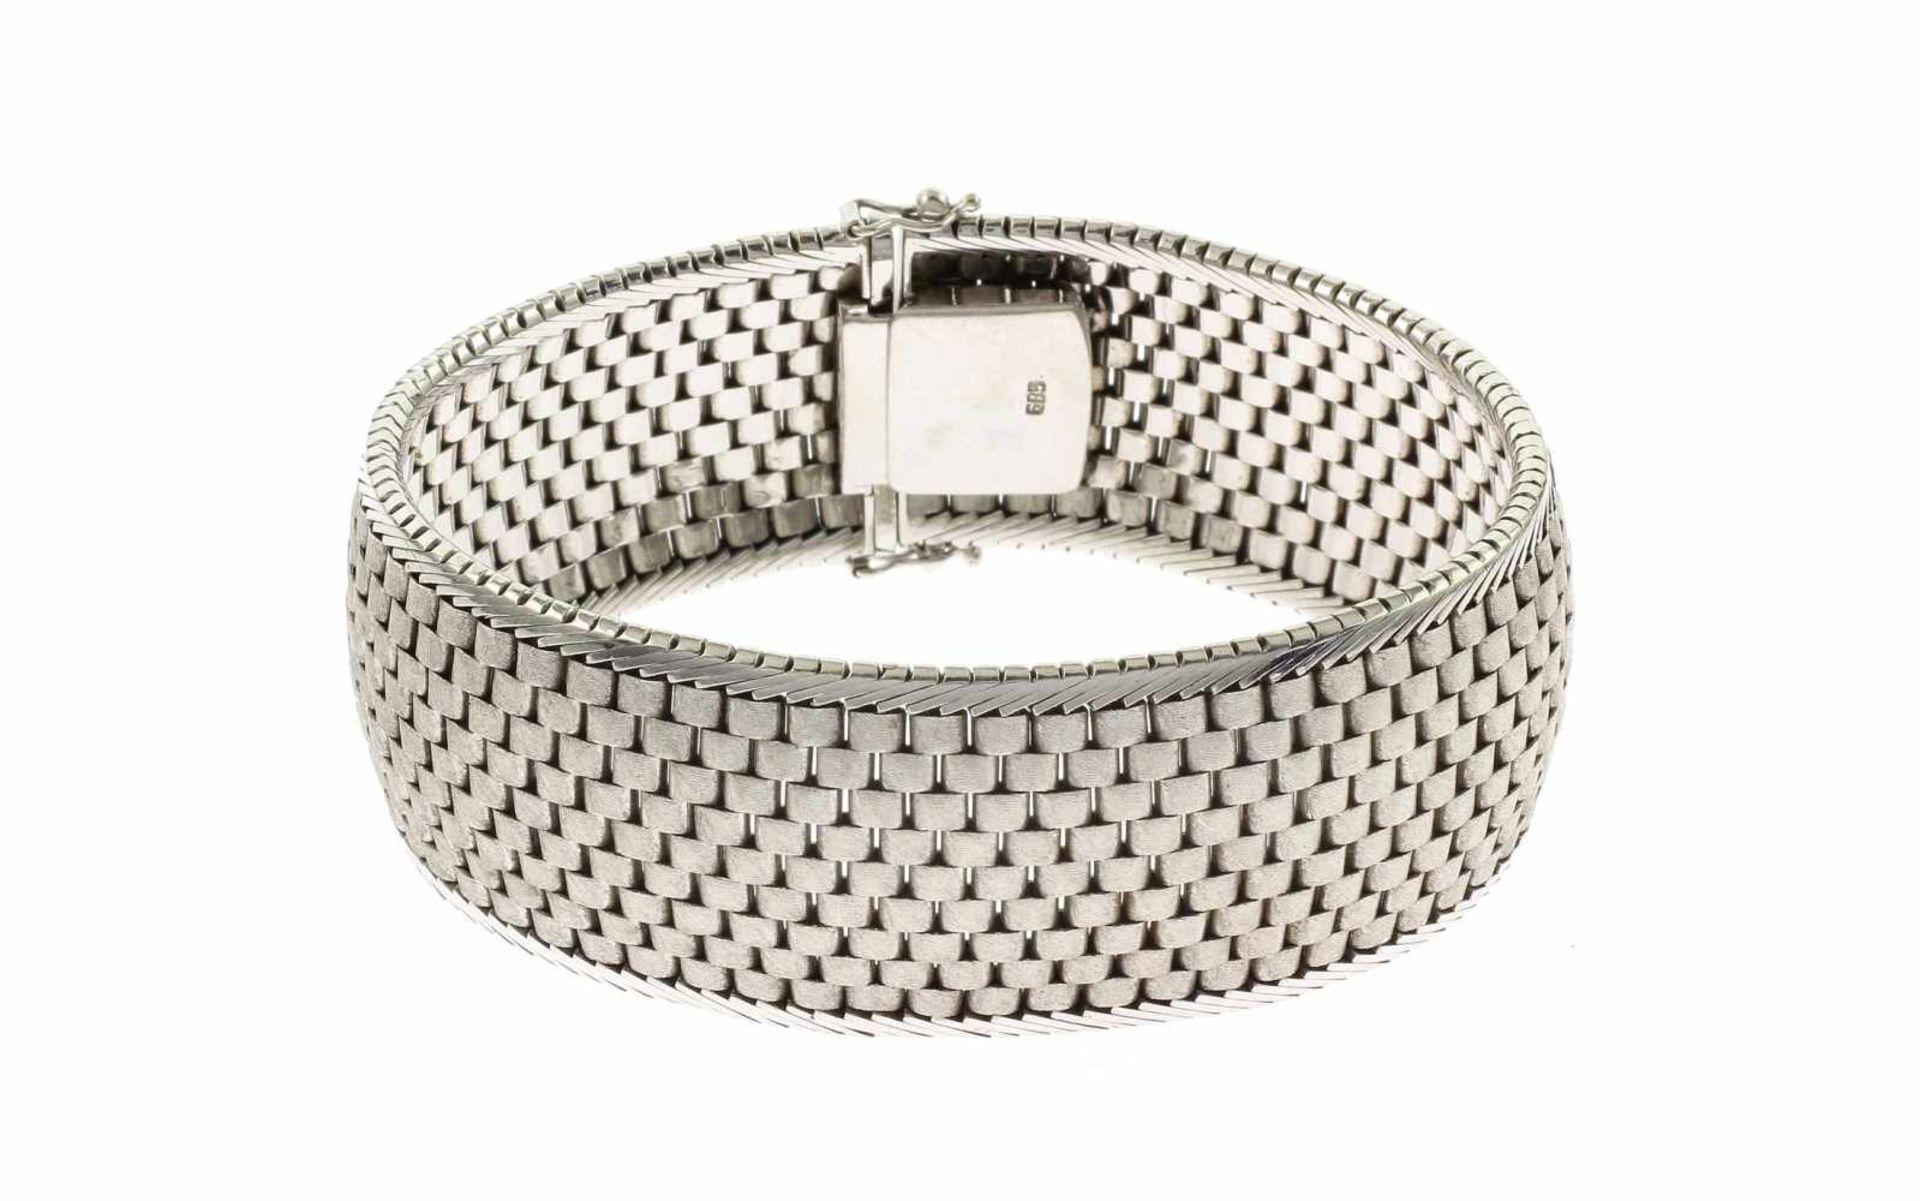 Los 3 - ArmbandArmband 585/- Weißgold, Länge ca. 19,00 cm, 64,33g